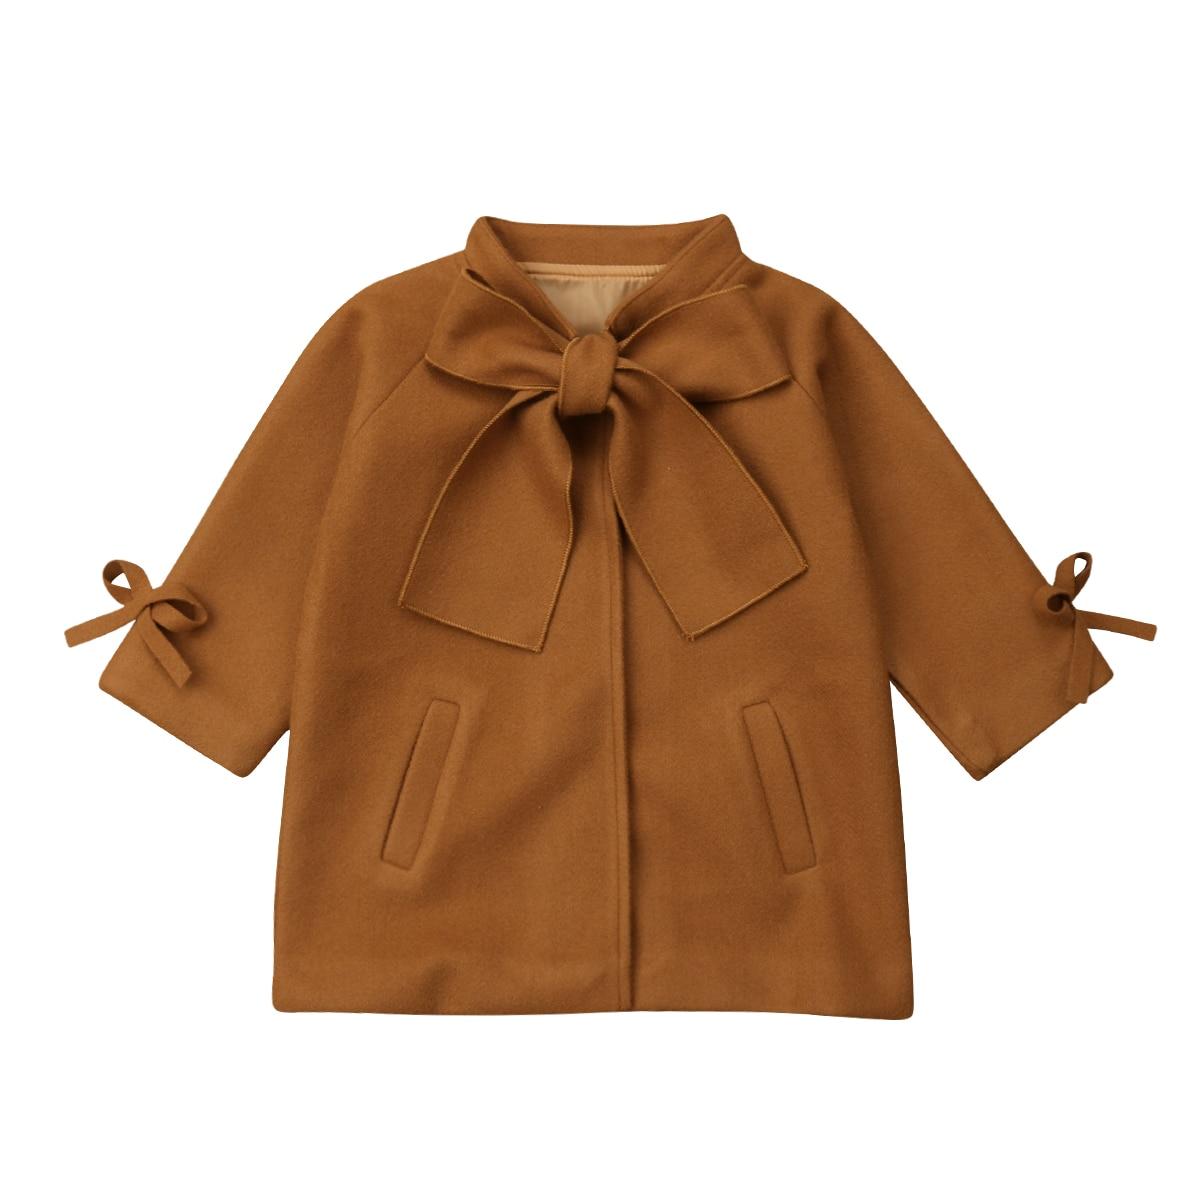 Niño bebé niña Invierno Caliente lana corbata de lazo capa manga larga abrigo chaqueta ropa